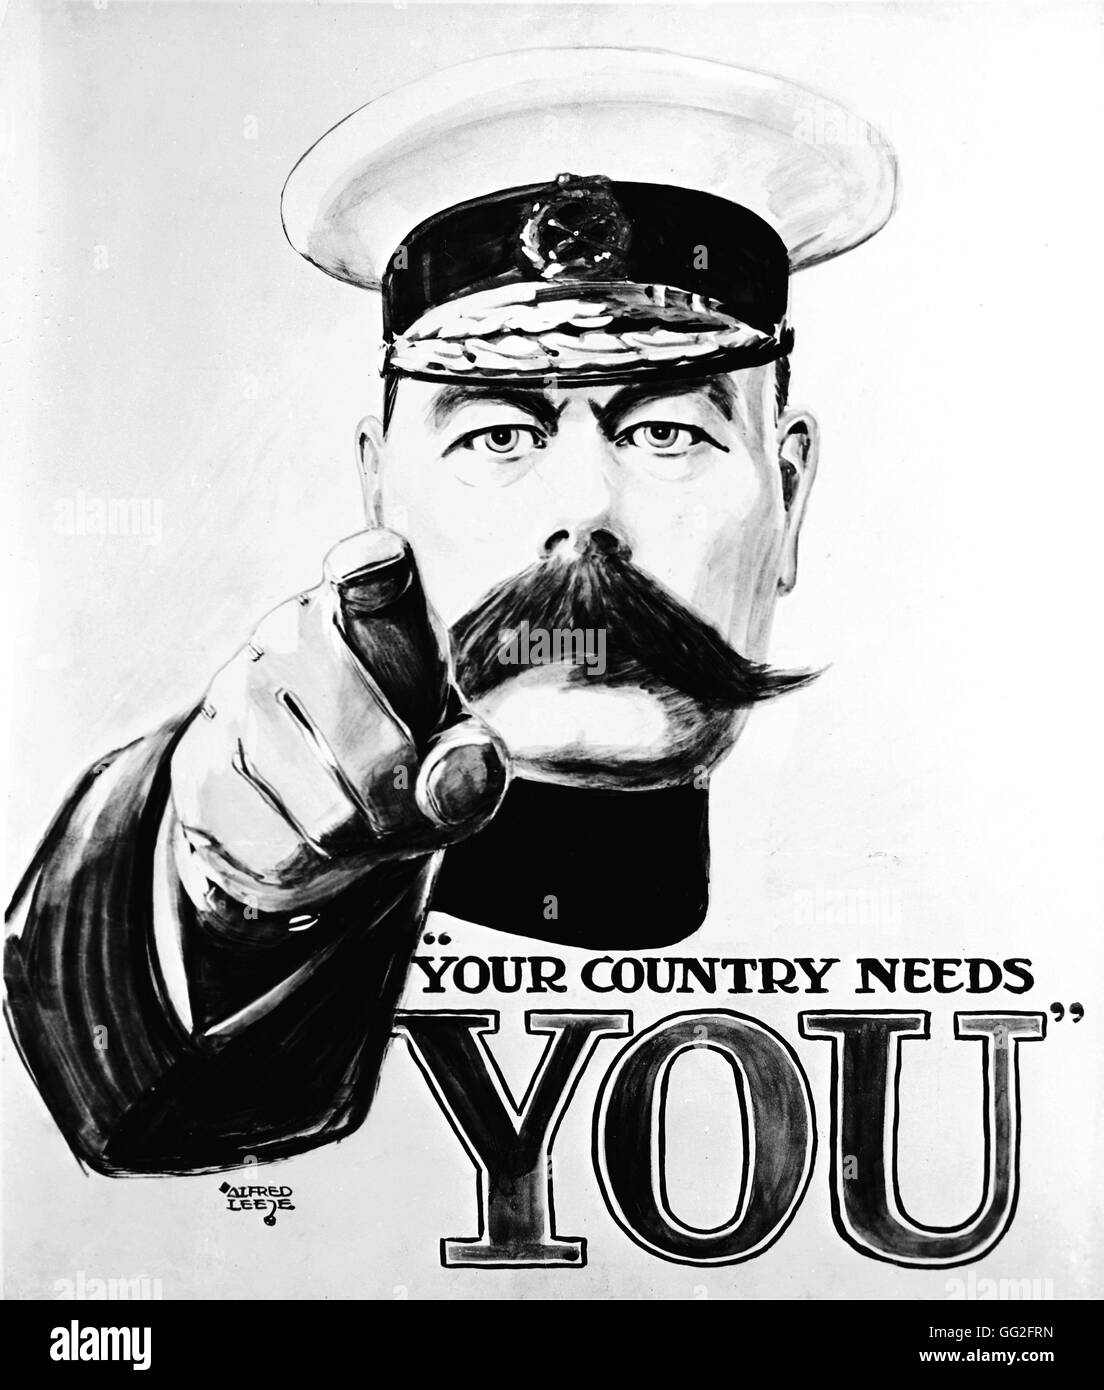 First World War. Recruitment poster, Lord Kitchener asking British ...